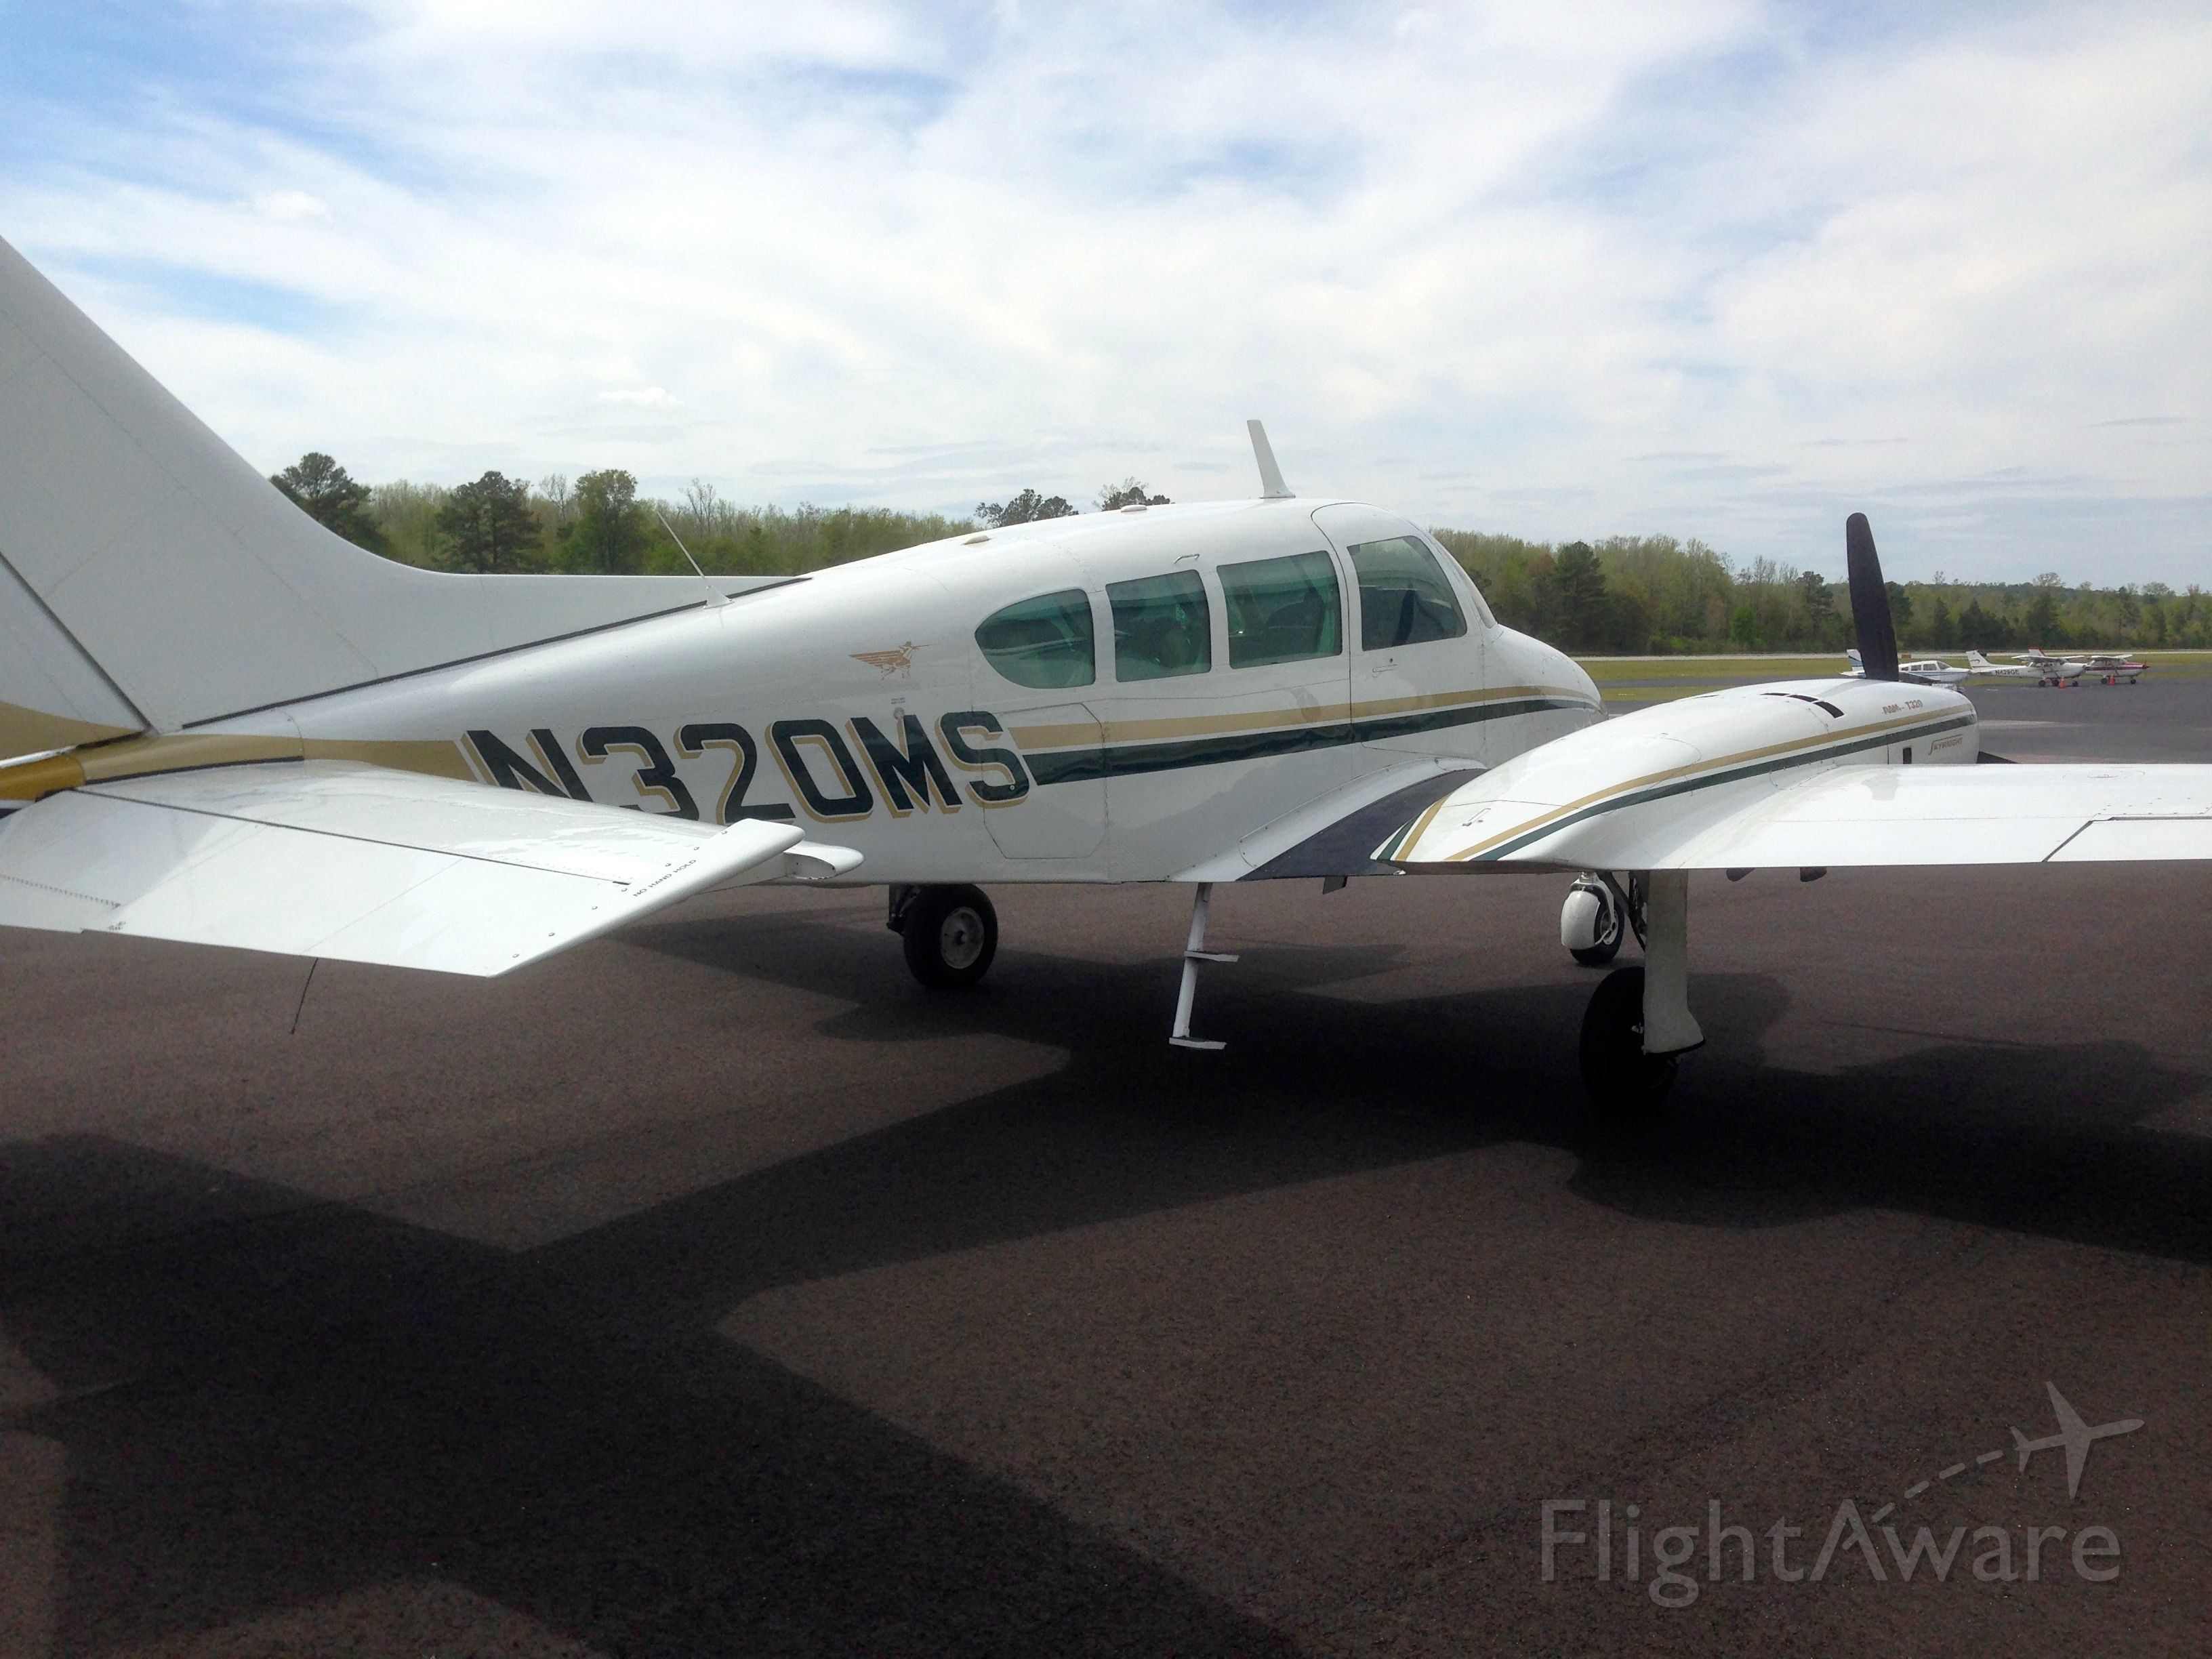 Cessna Executive Skyknight (N320MS)